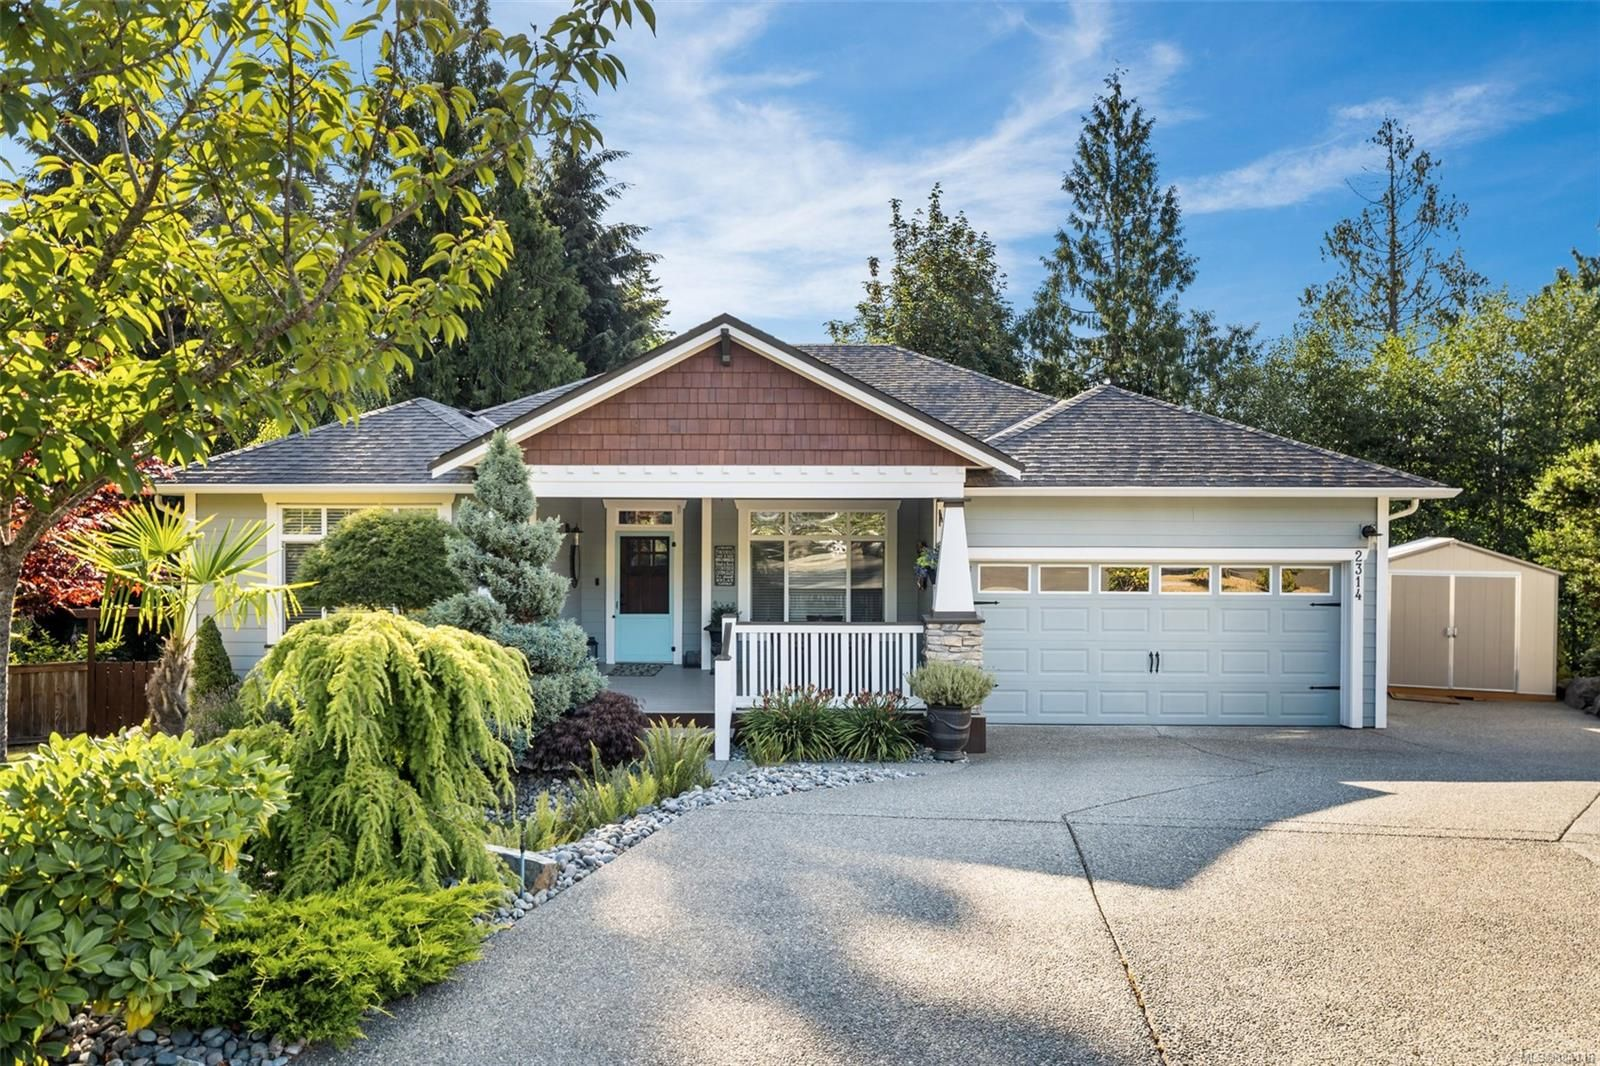 Main Photo: 2314 Rivers Edge Pl in : Sk Sunriver House for sale (Sooke)  : MLS®# 884116